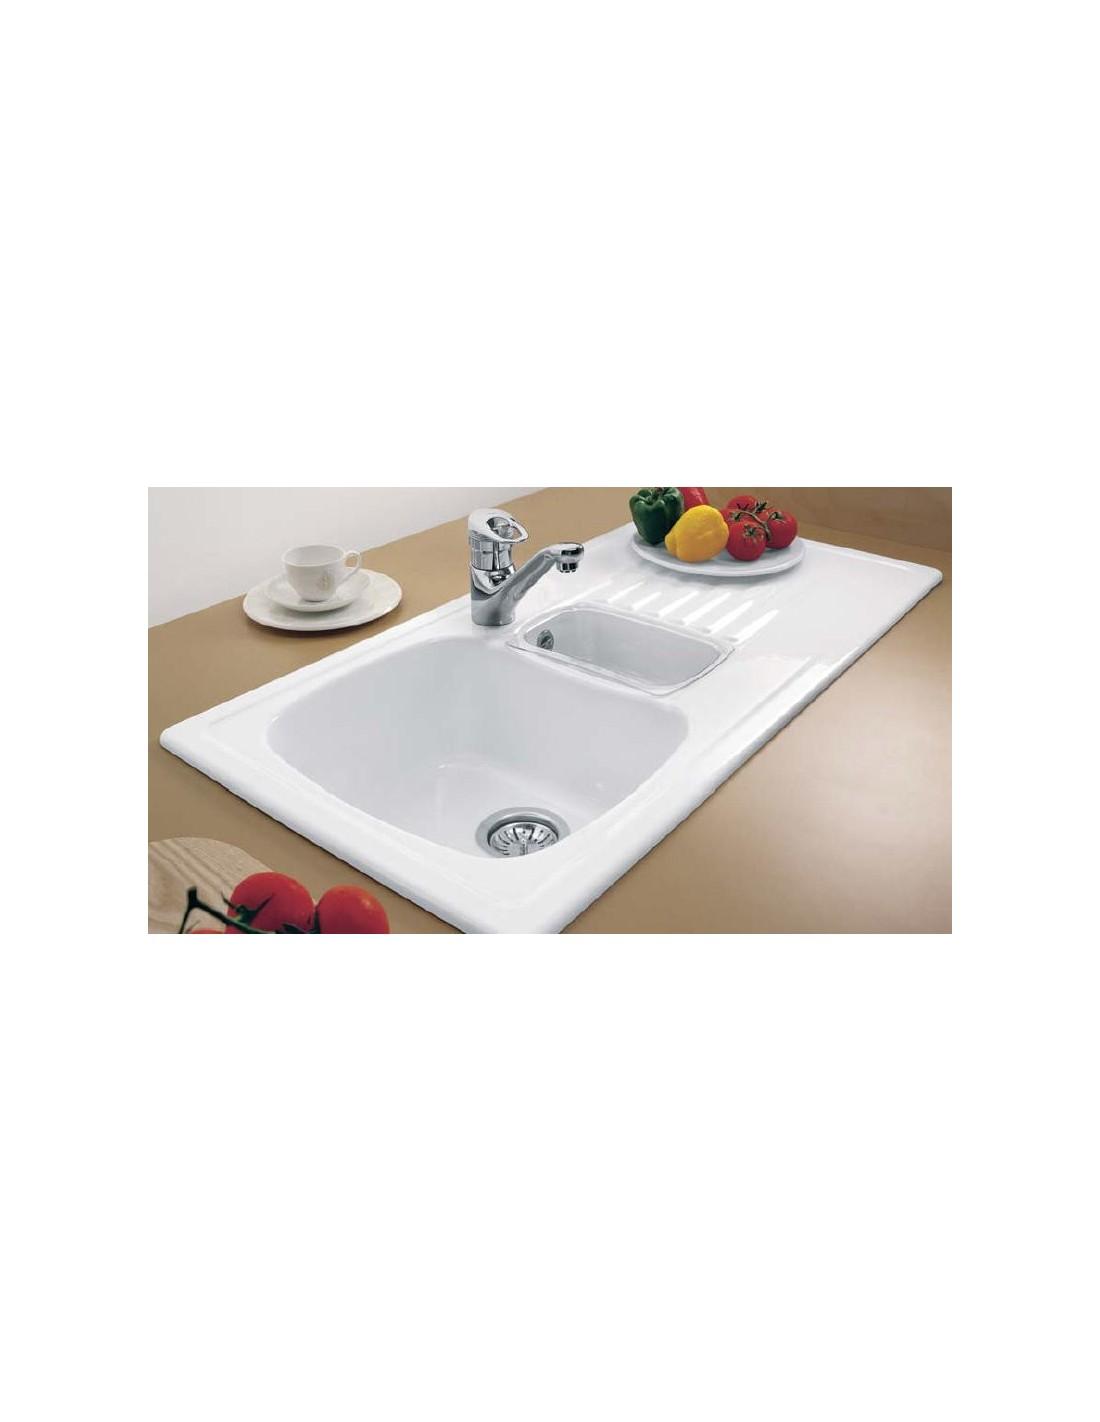 Villeroy & Boch Medici Ceramic Kitchen Sink 1.5 Bowl 6753 ...